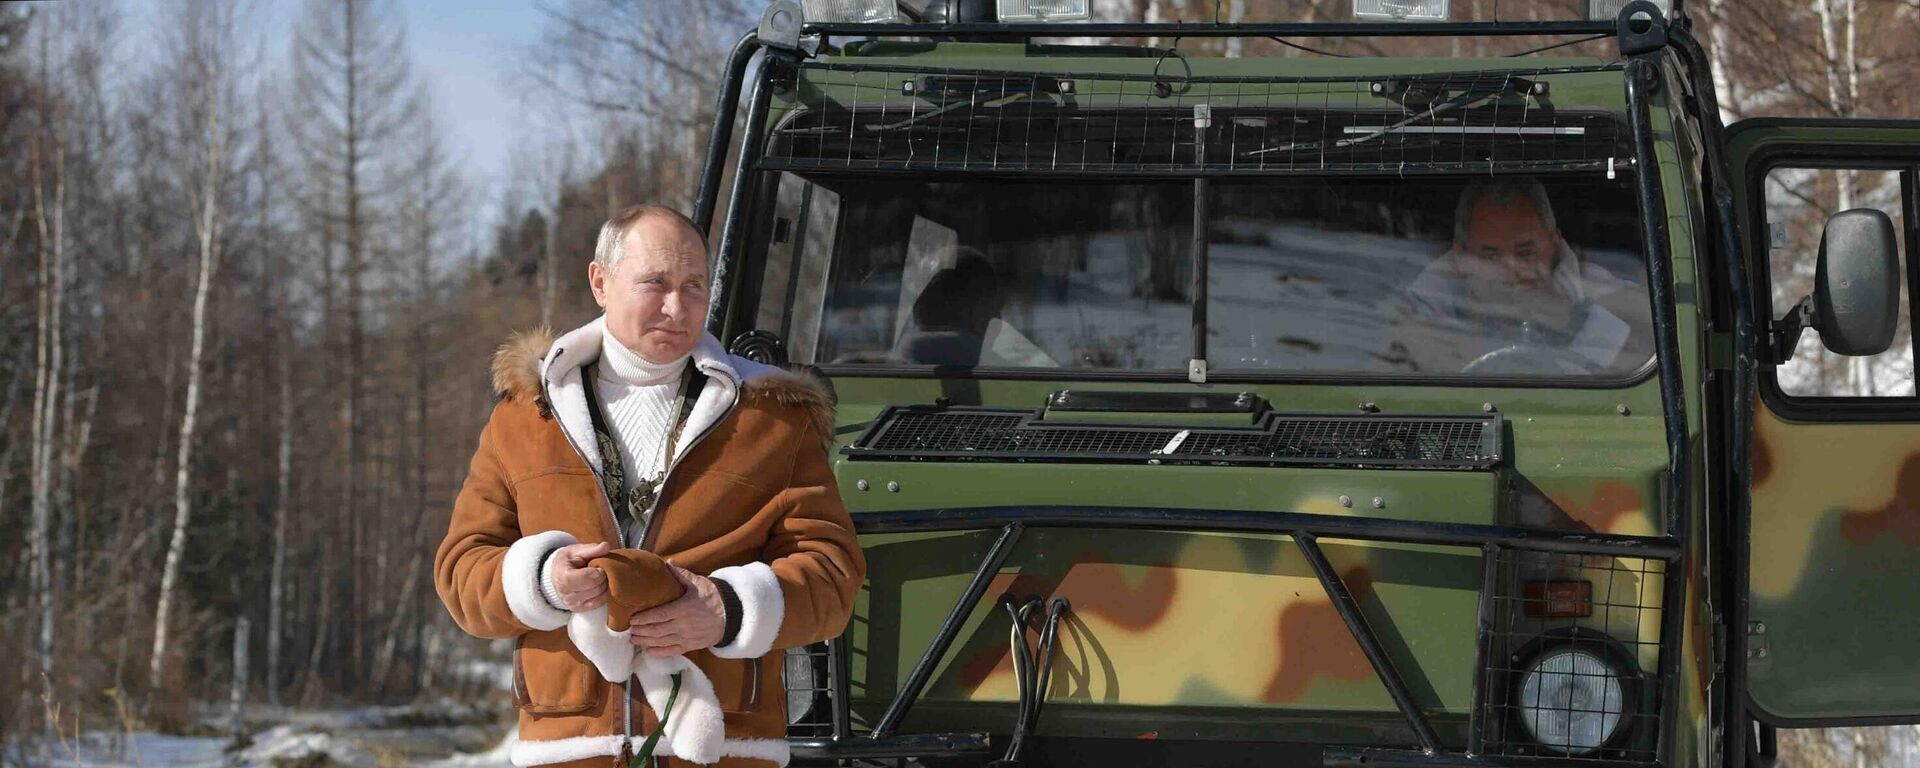 21 марта 2021. Президент РФ Владимир Путин во время прогулки в тайге. - Sputnik Азербайджан, 1920, 07.10.2021